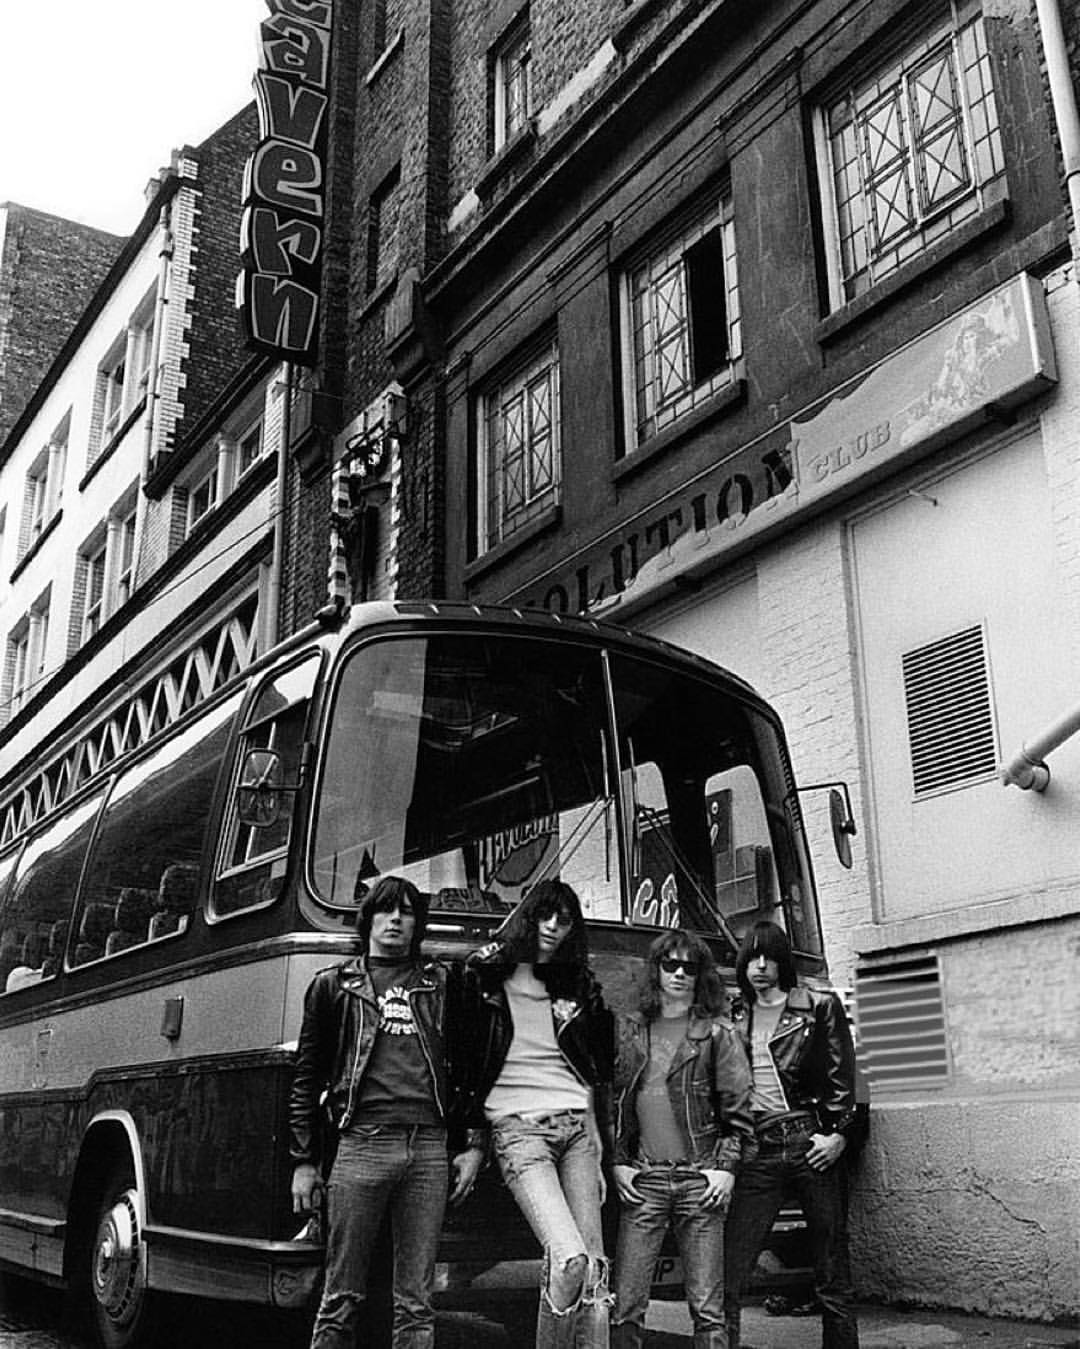 RamonesLiverpool1977CavernClub.jpg